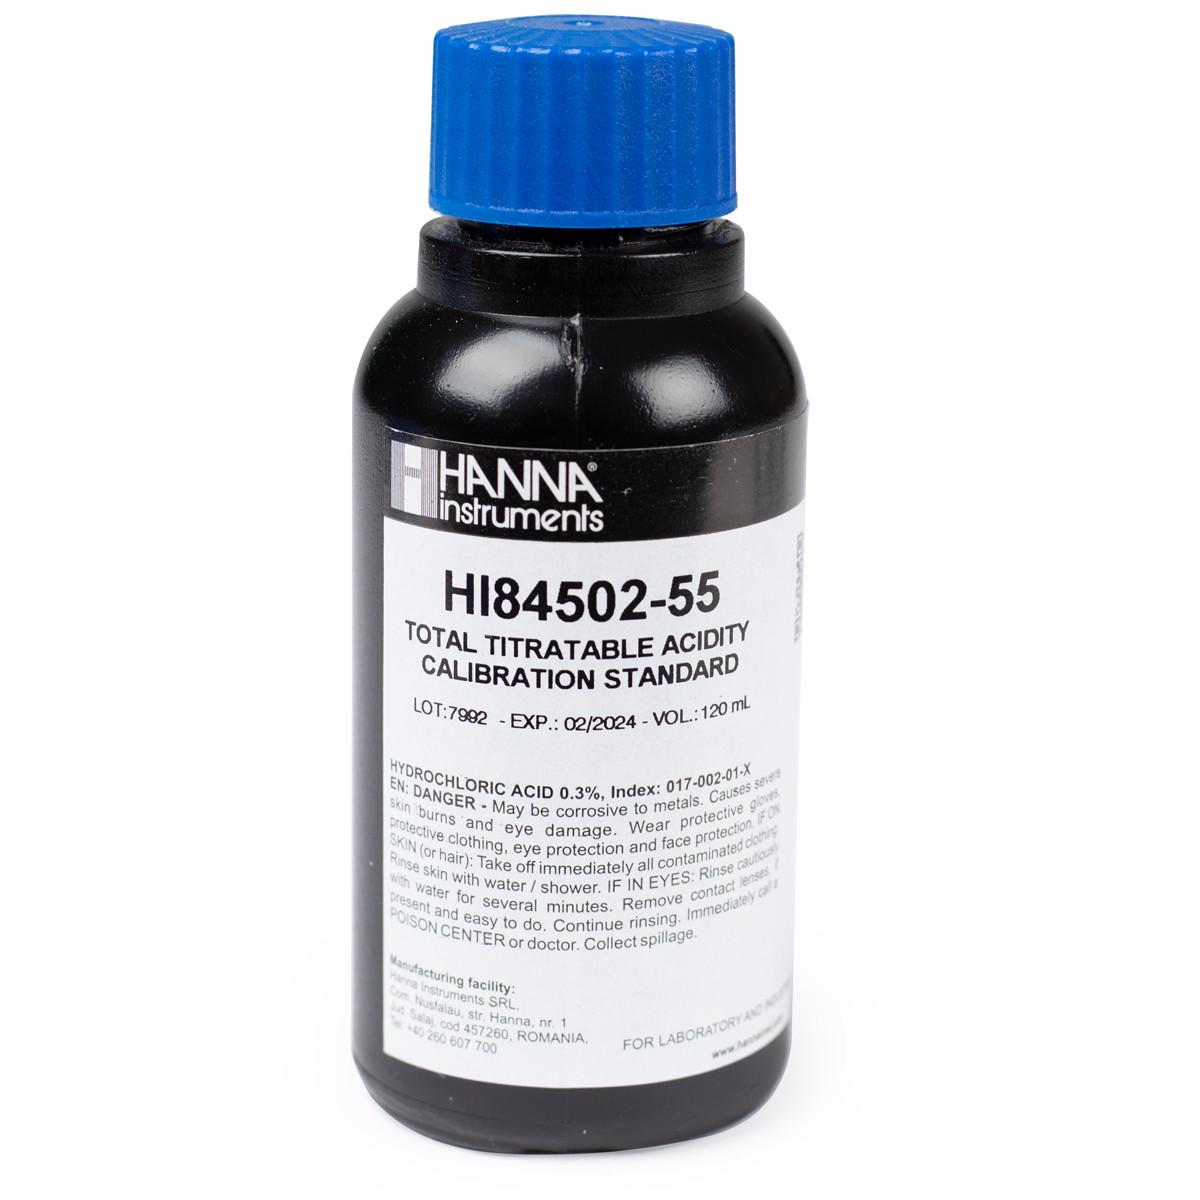 Pump Calibration Standard for Titratable Acidity in Wine Mini Titrator